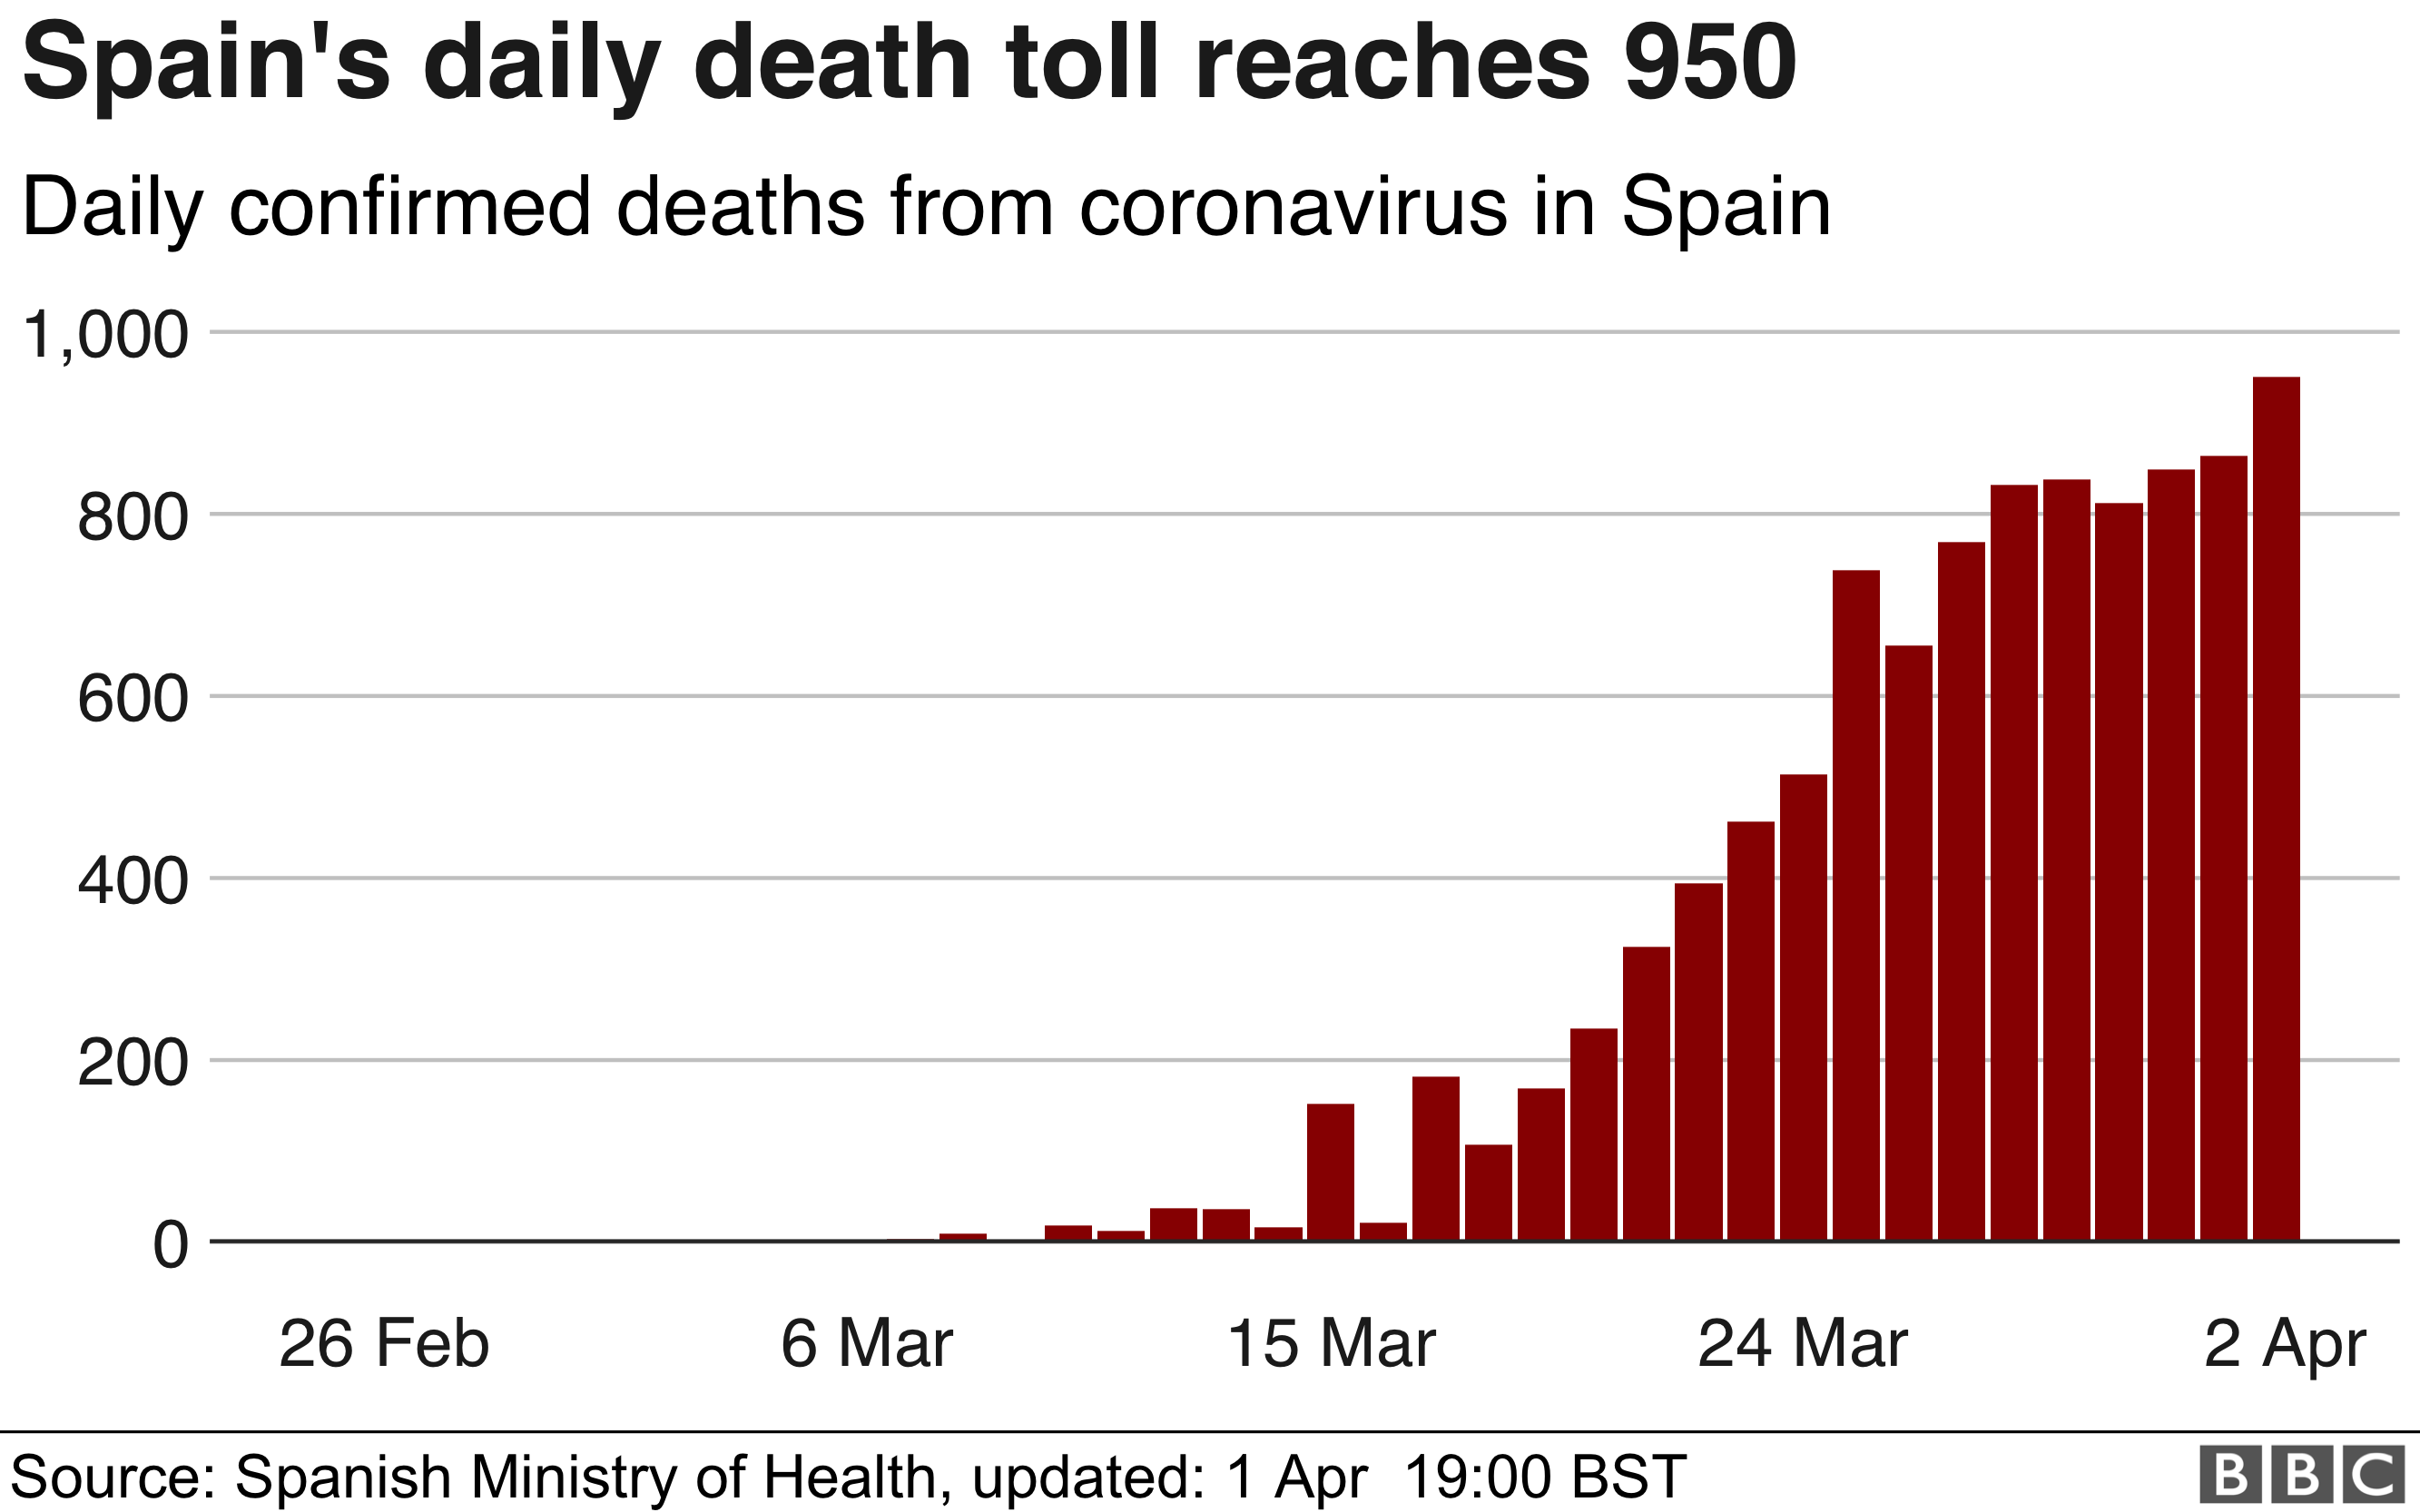 Chart showing Spain' daily coronavirus death toll